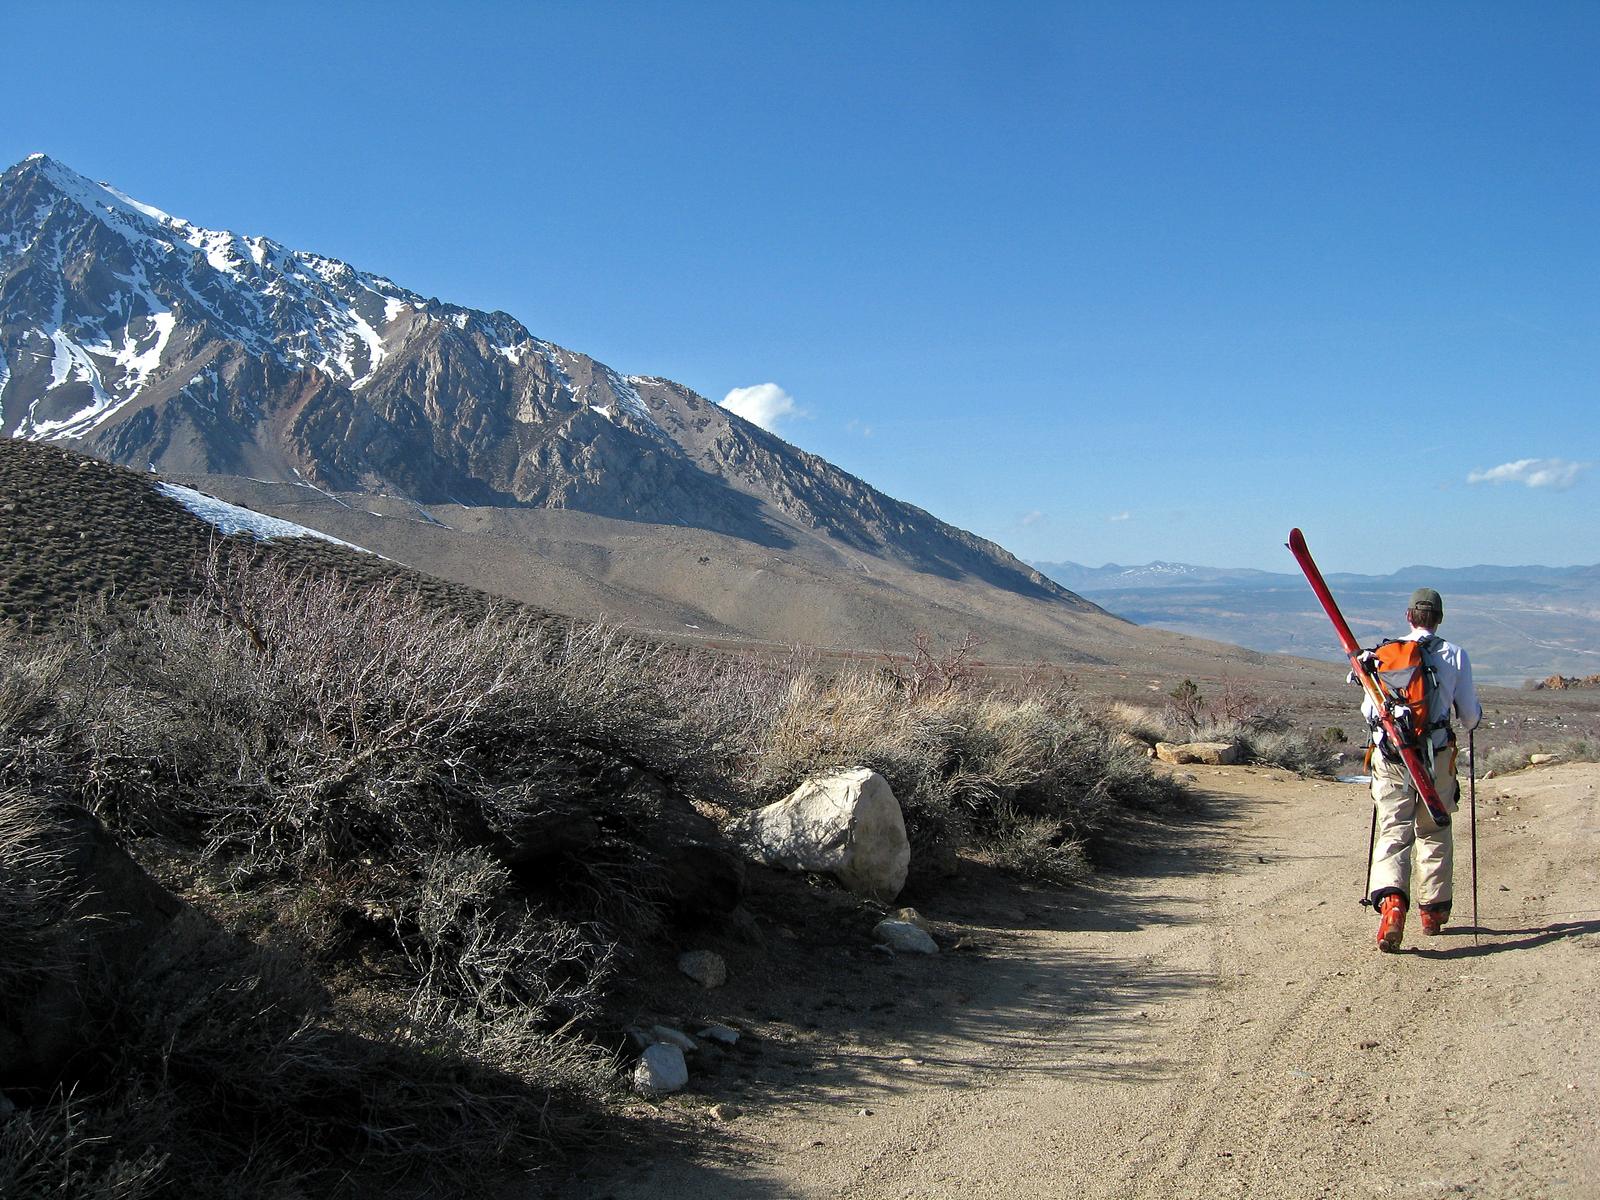 backcountry skiing in the eastern Sierra, California